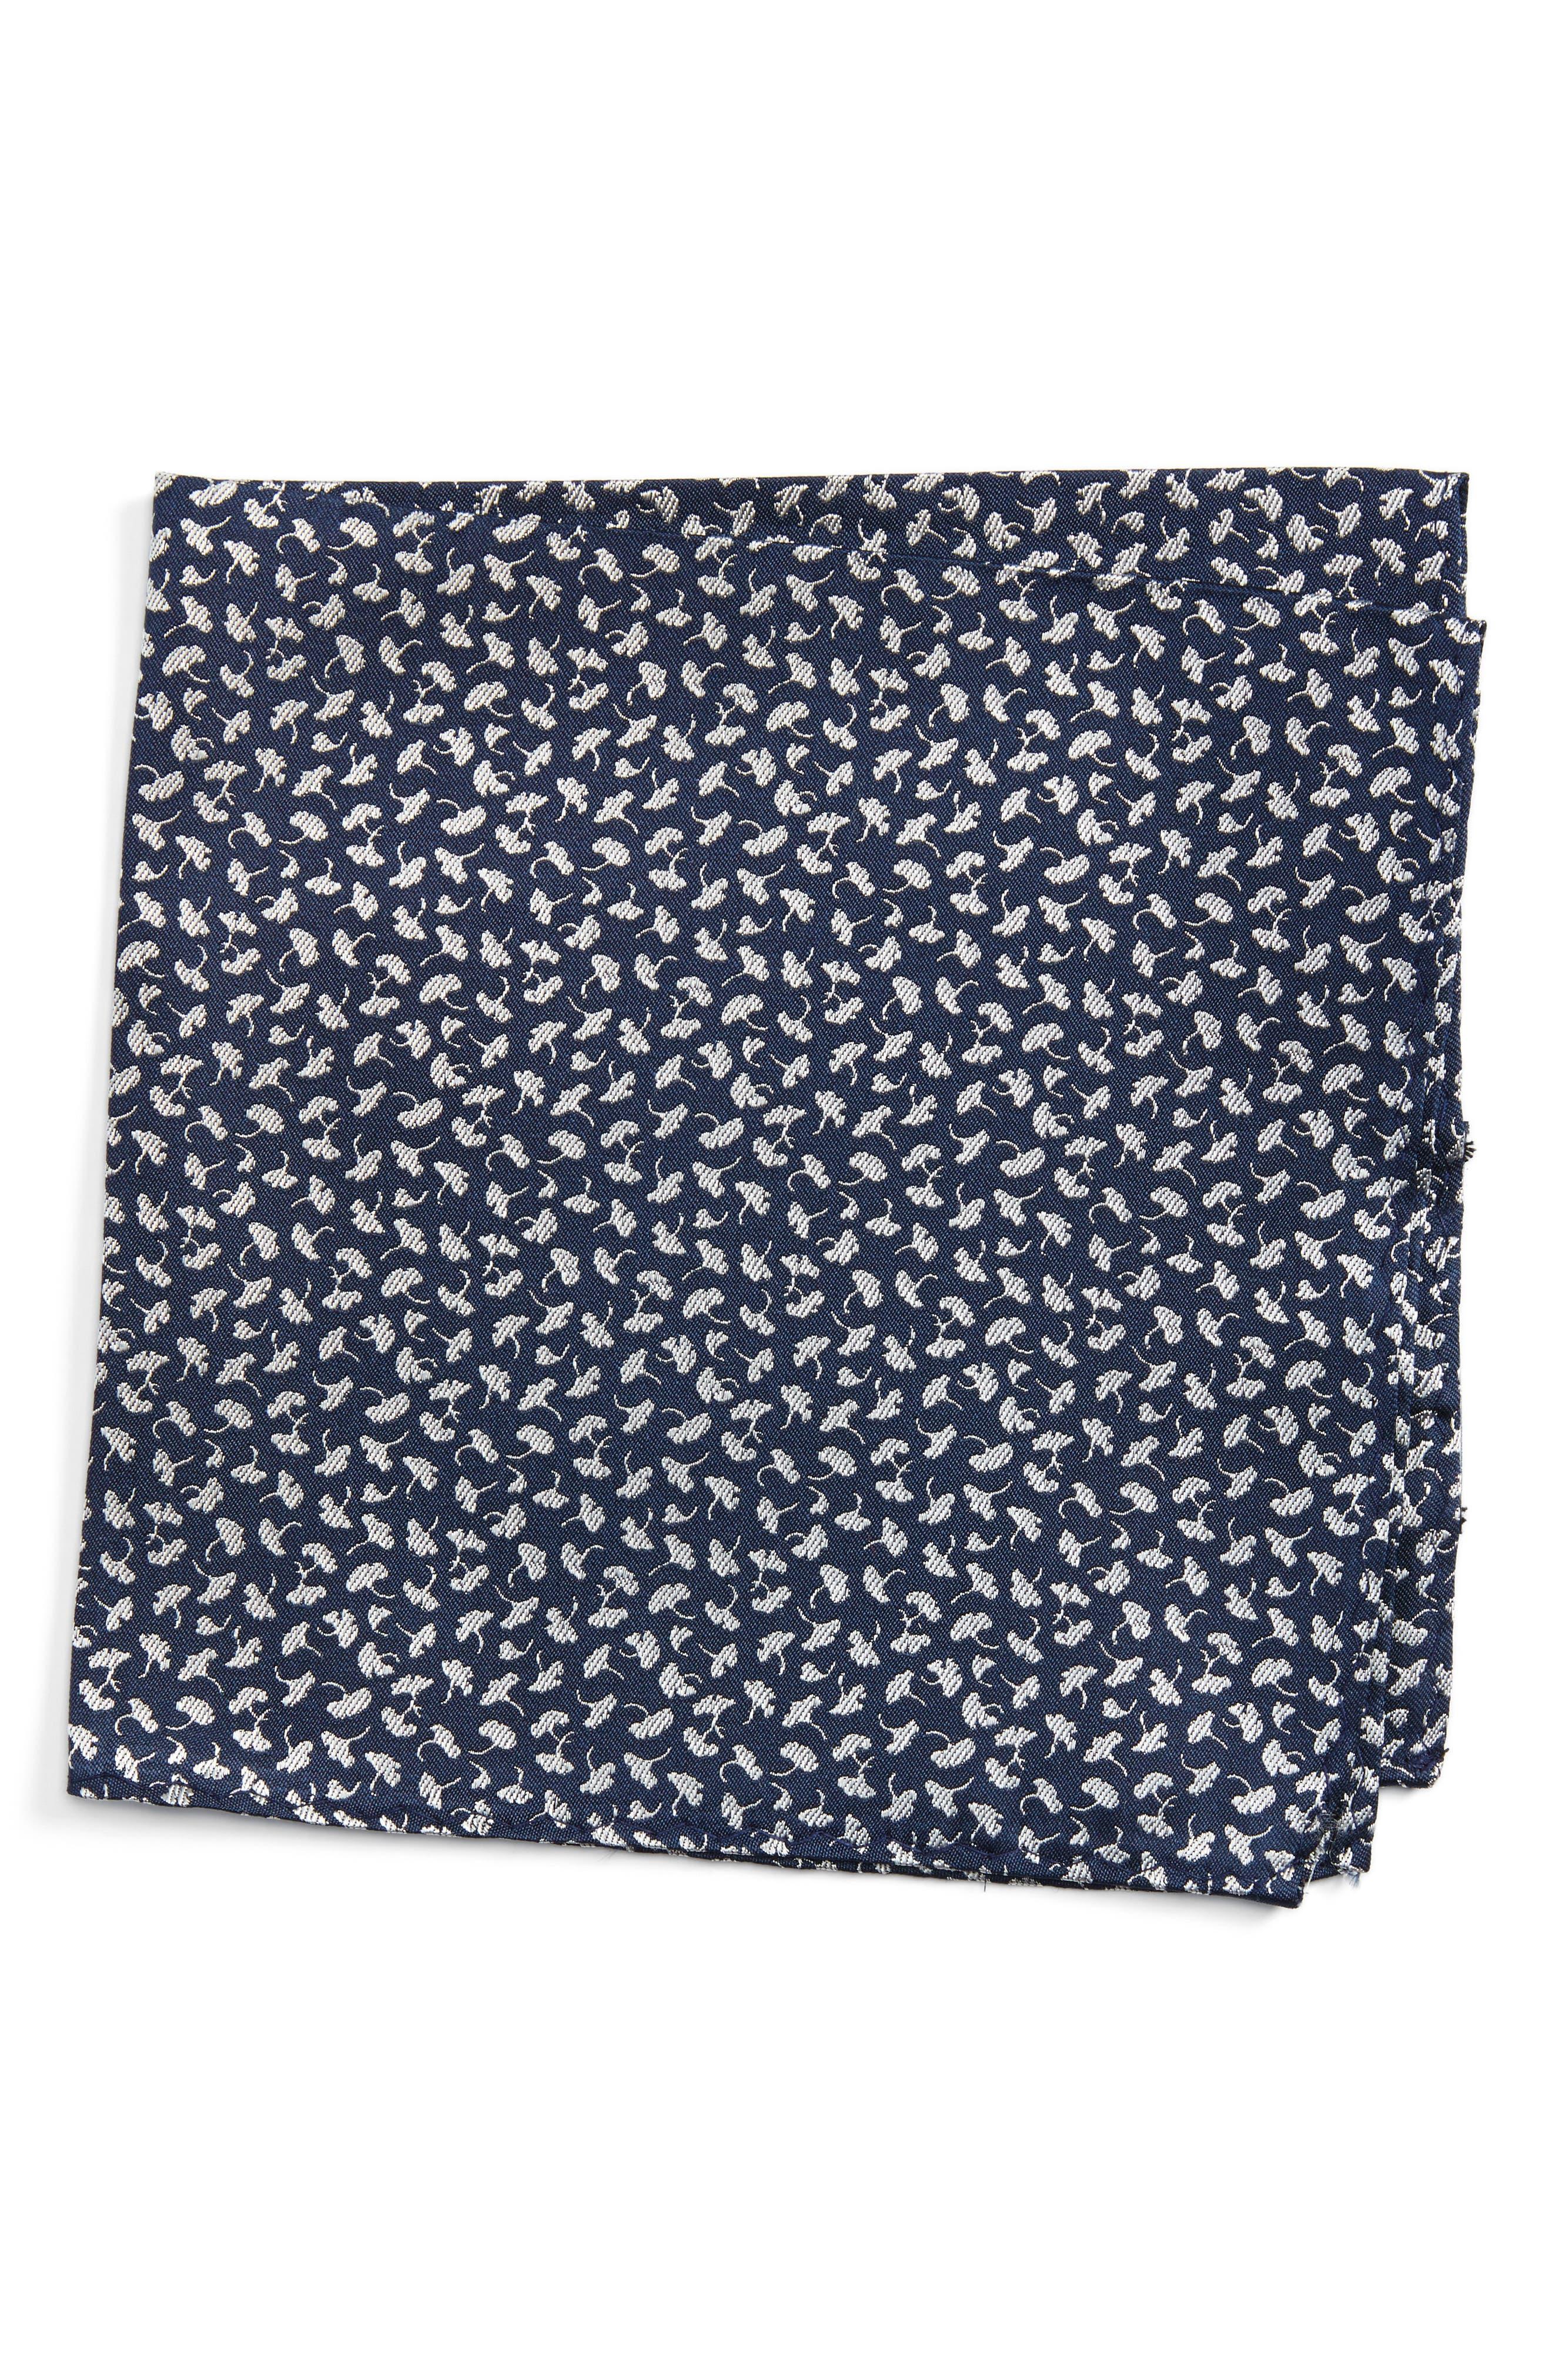 Alternate Image 1 Selected - The Tie Bar Floral Silk Pocket Square